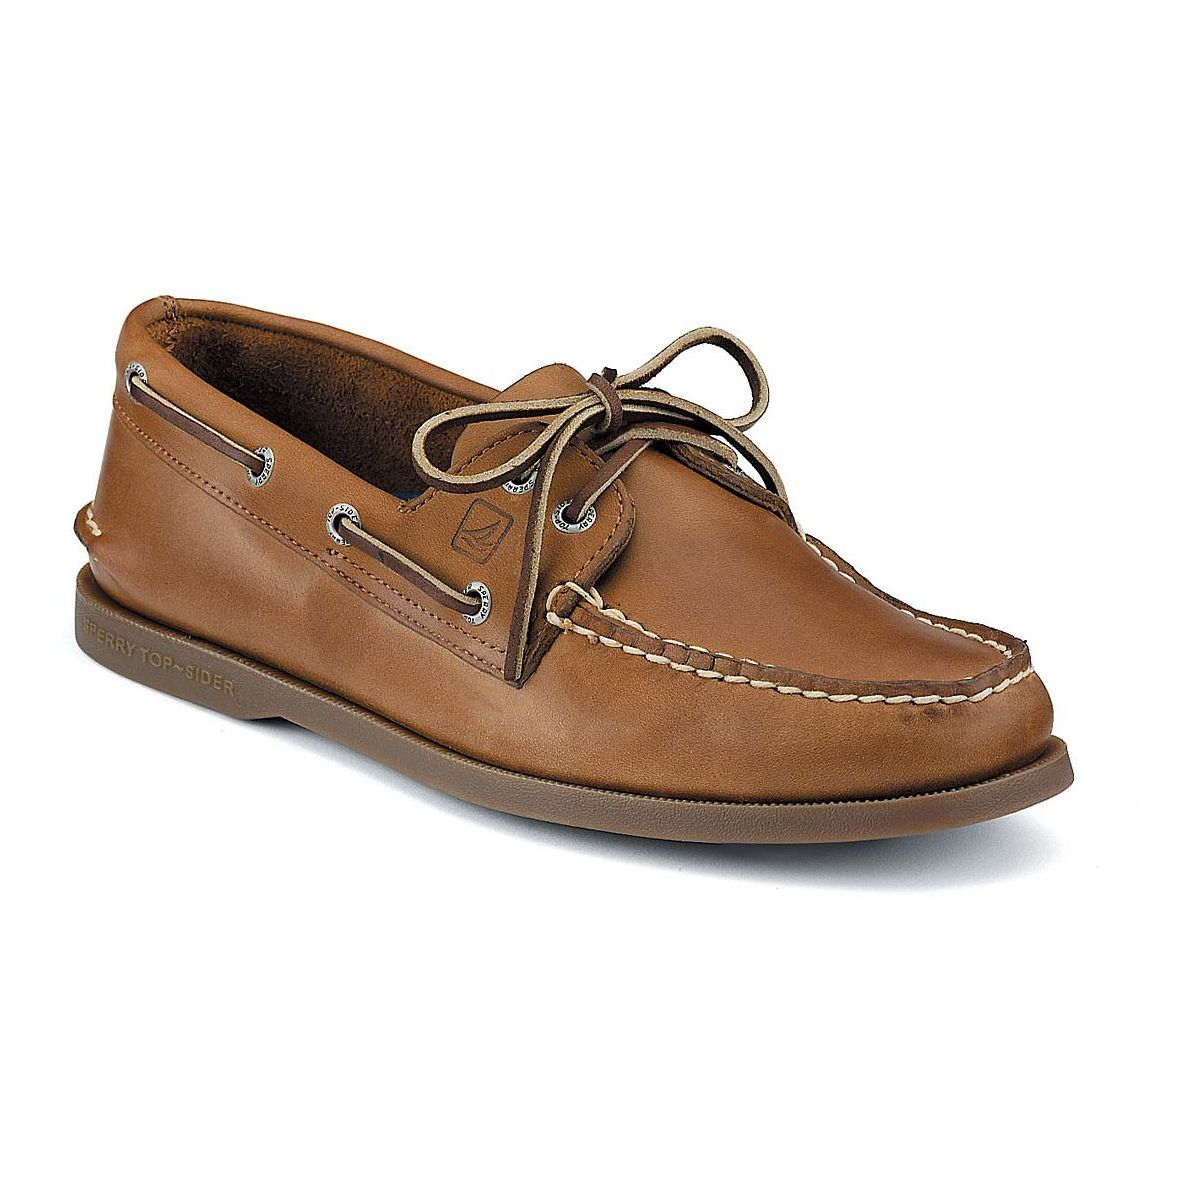 Choose the Authentic Original Men's Boat Shoe | Sperry Top